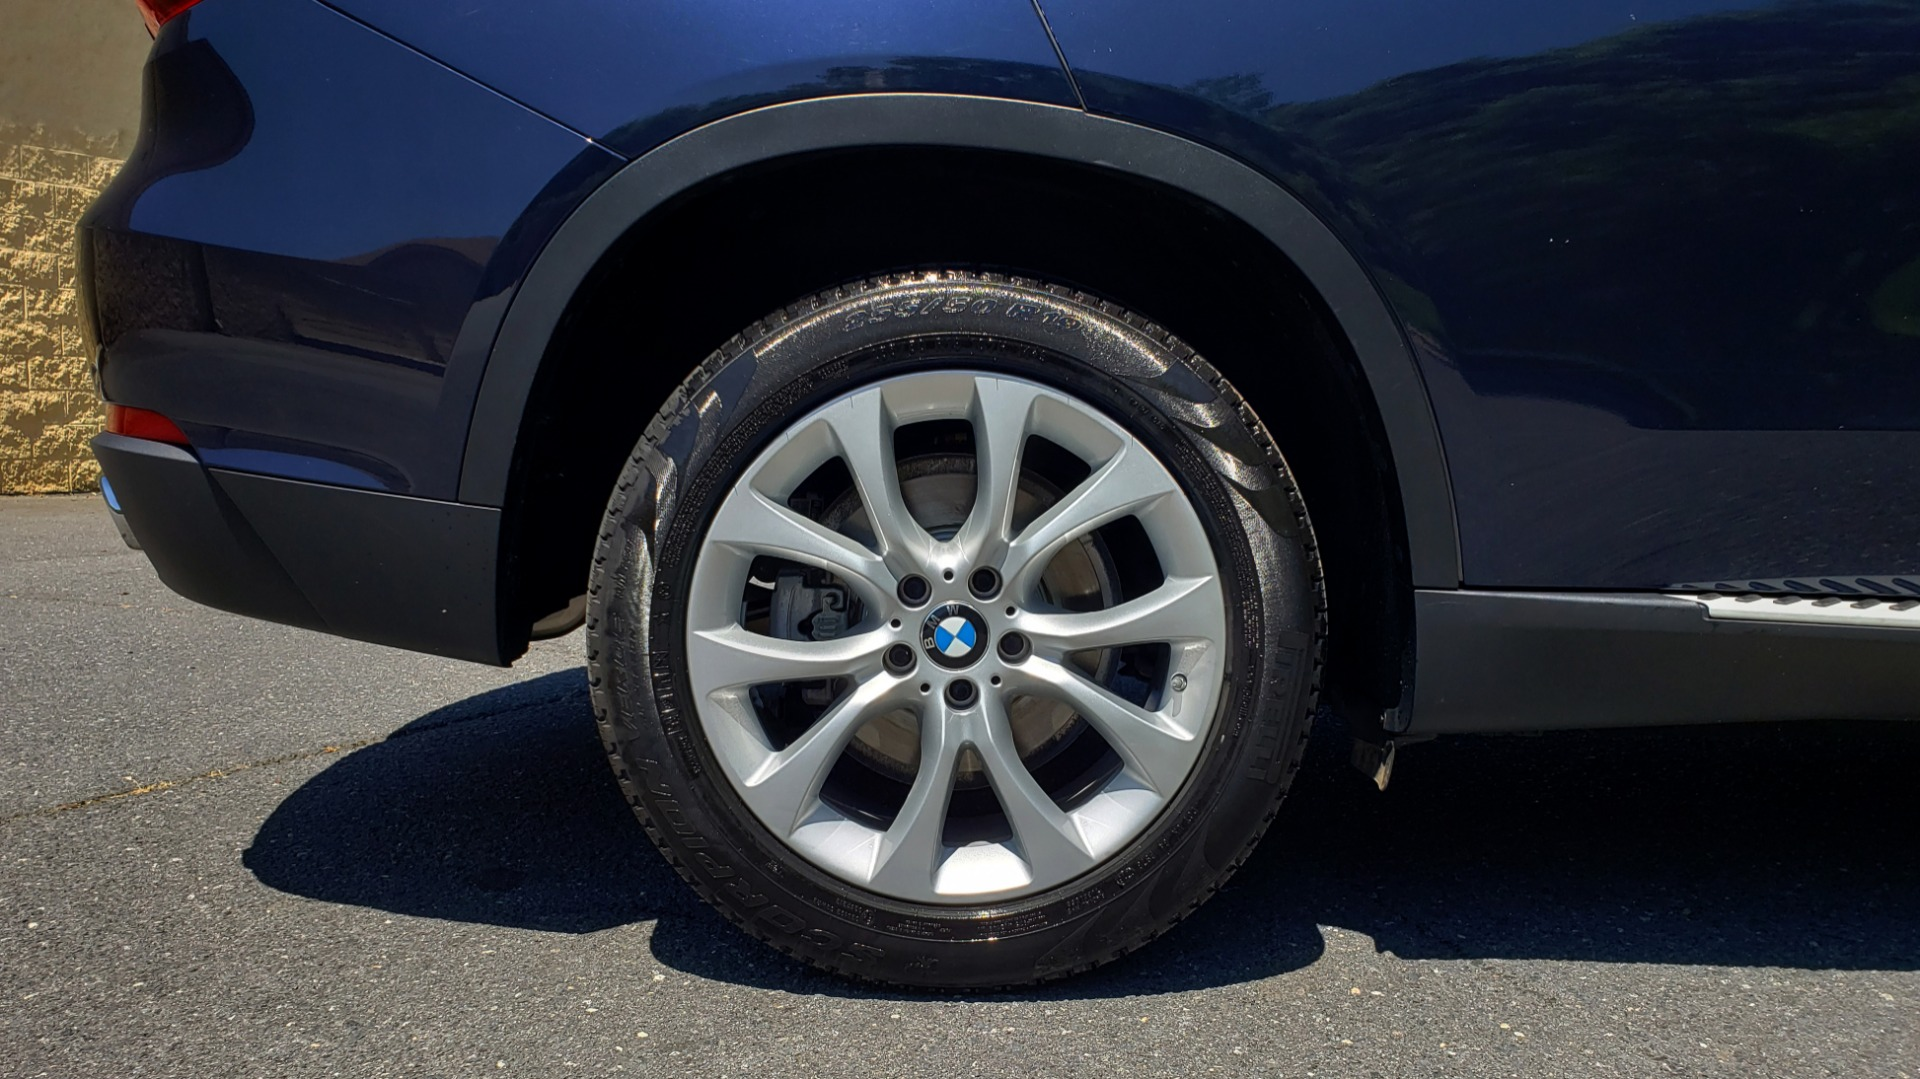 Used 2016 BMW X5 XDRIVE35I / PREM PKG / NAV / DRVR ASST PLUS / REARVIEW for sale $25,765 at Formula Imports in Charlotte NC 28227 65